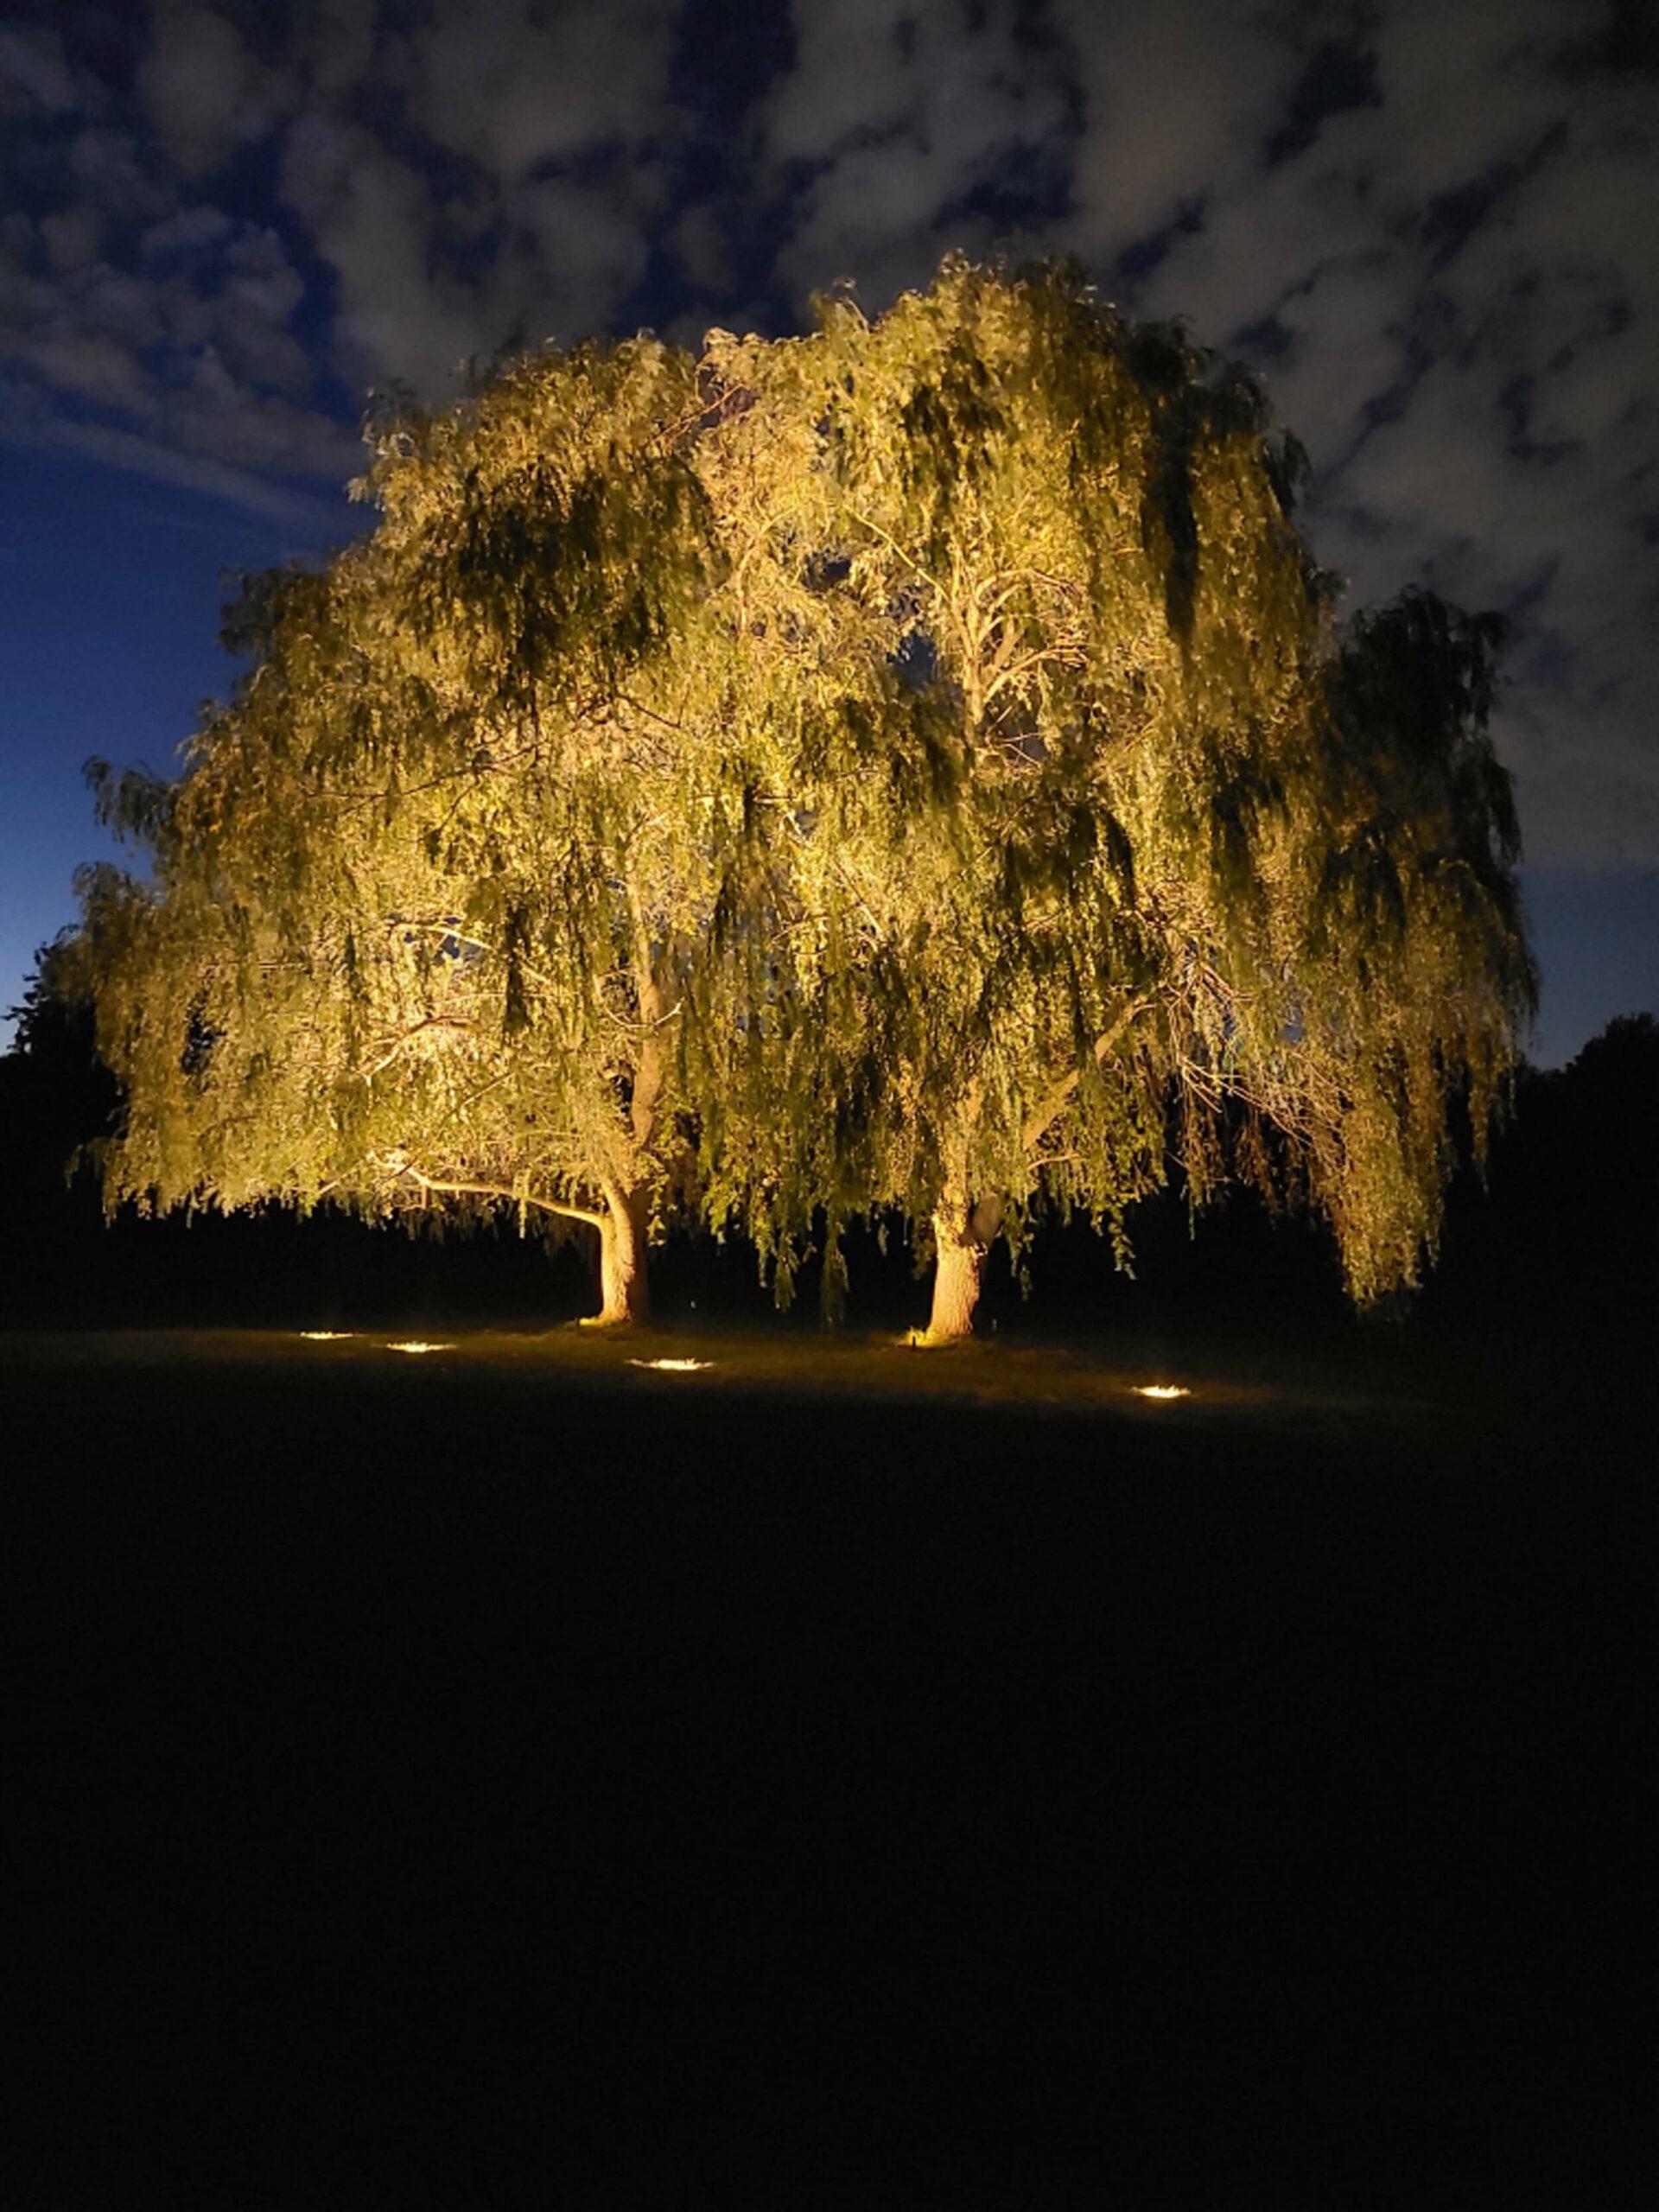 Majestic willow tree in Hamilton Ontario